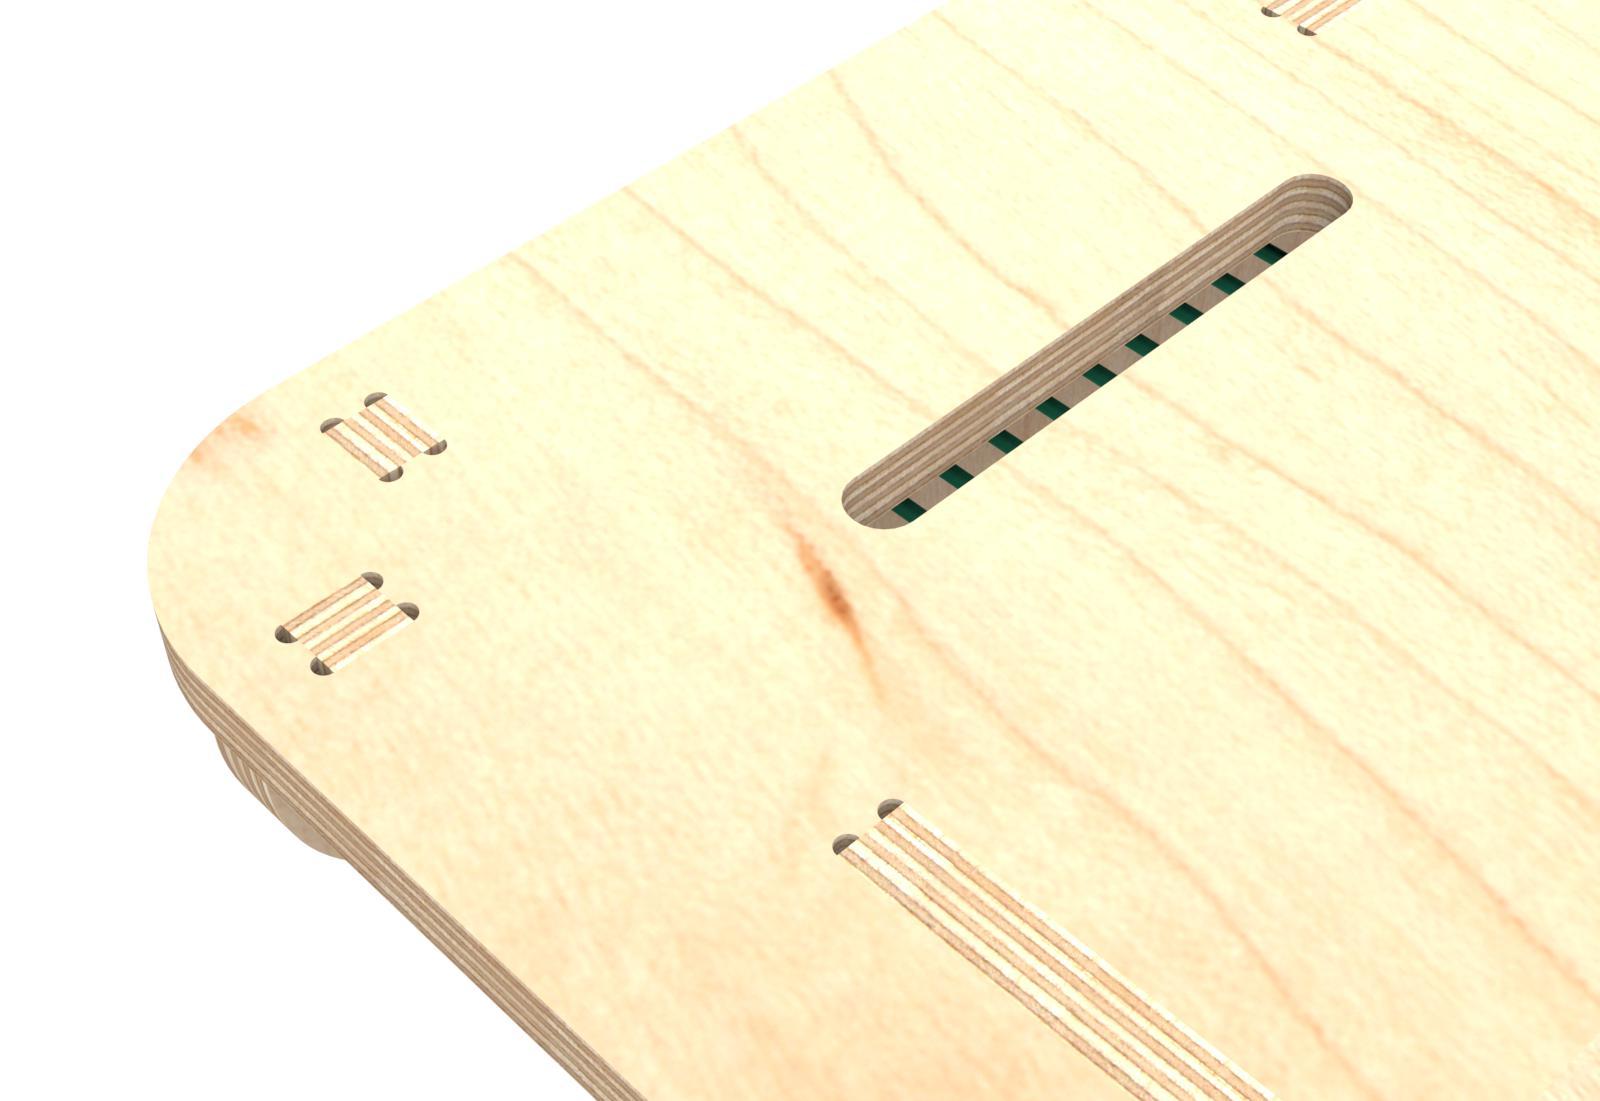 CNCDesk – Design 02 w elastics – Detail 02